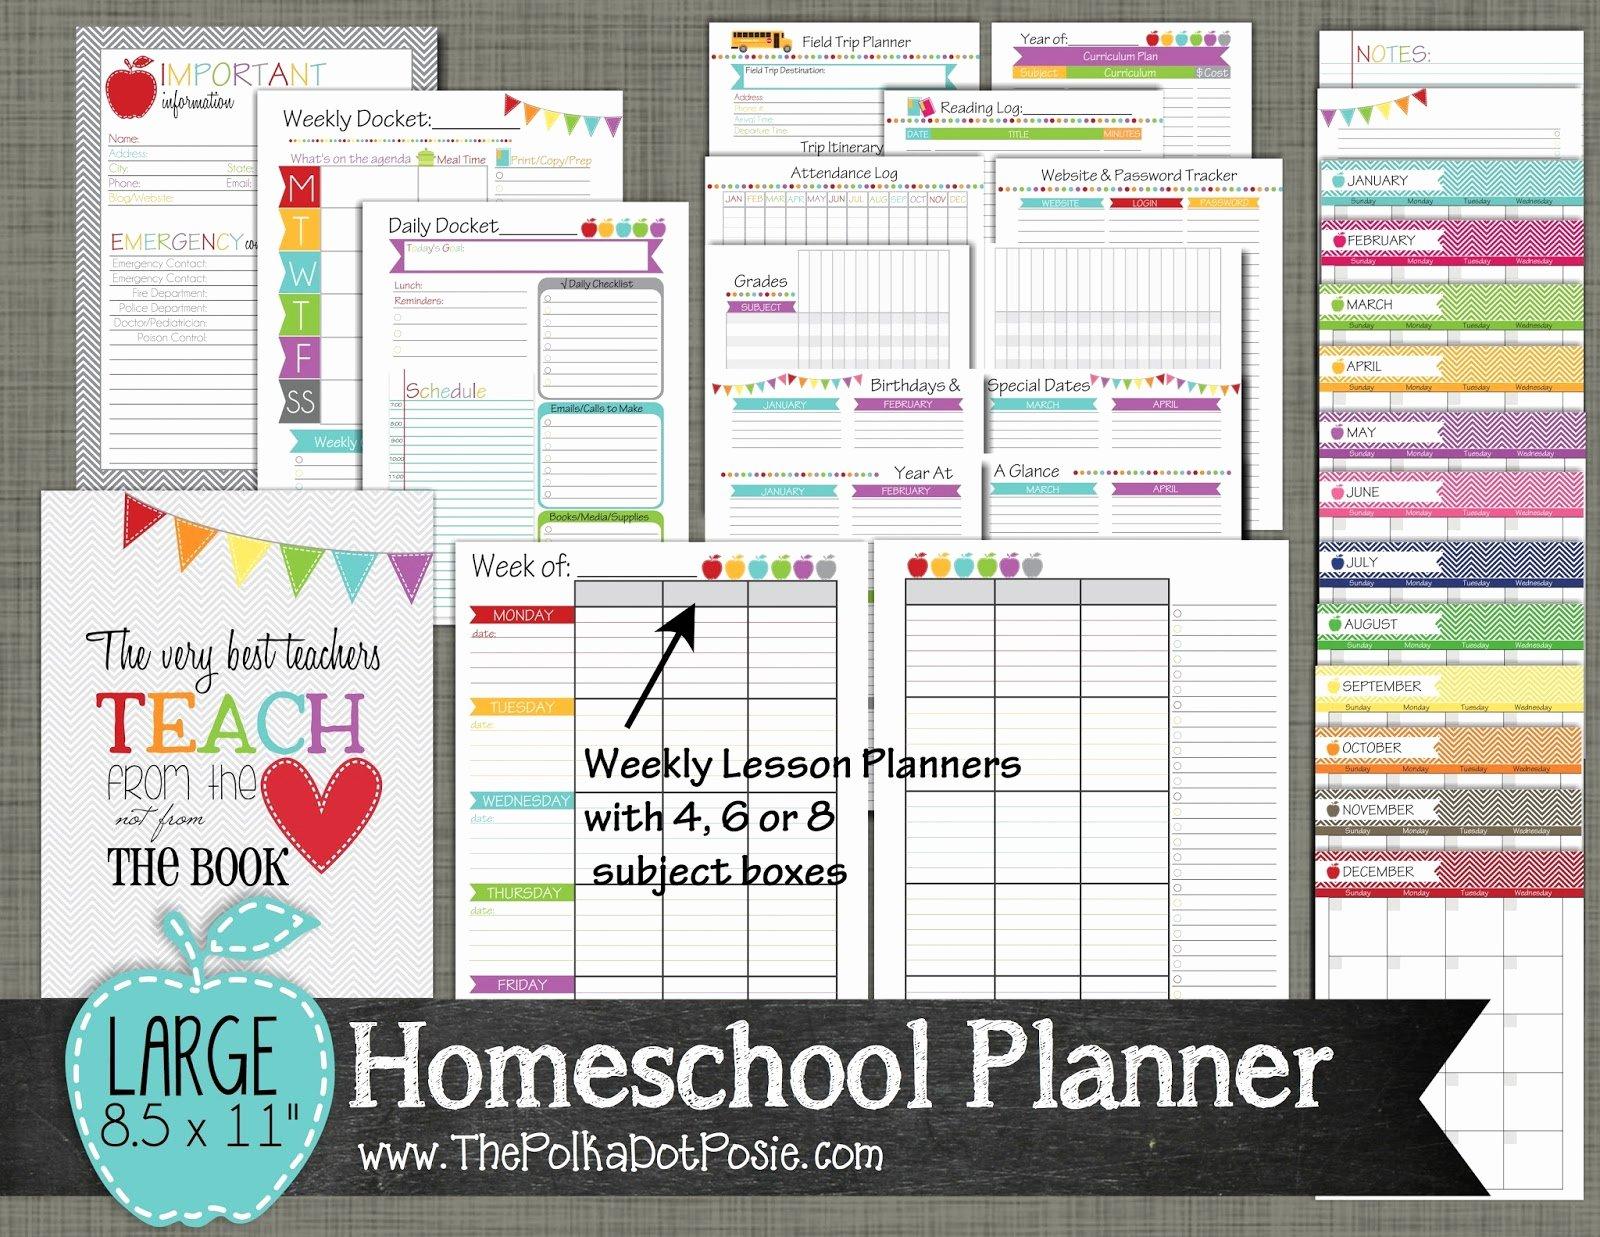 The Polka Dot Posie New Teacher & Homeschool Planners